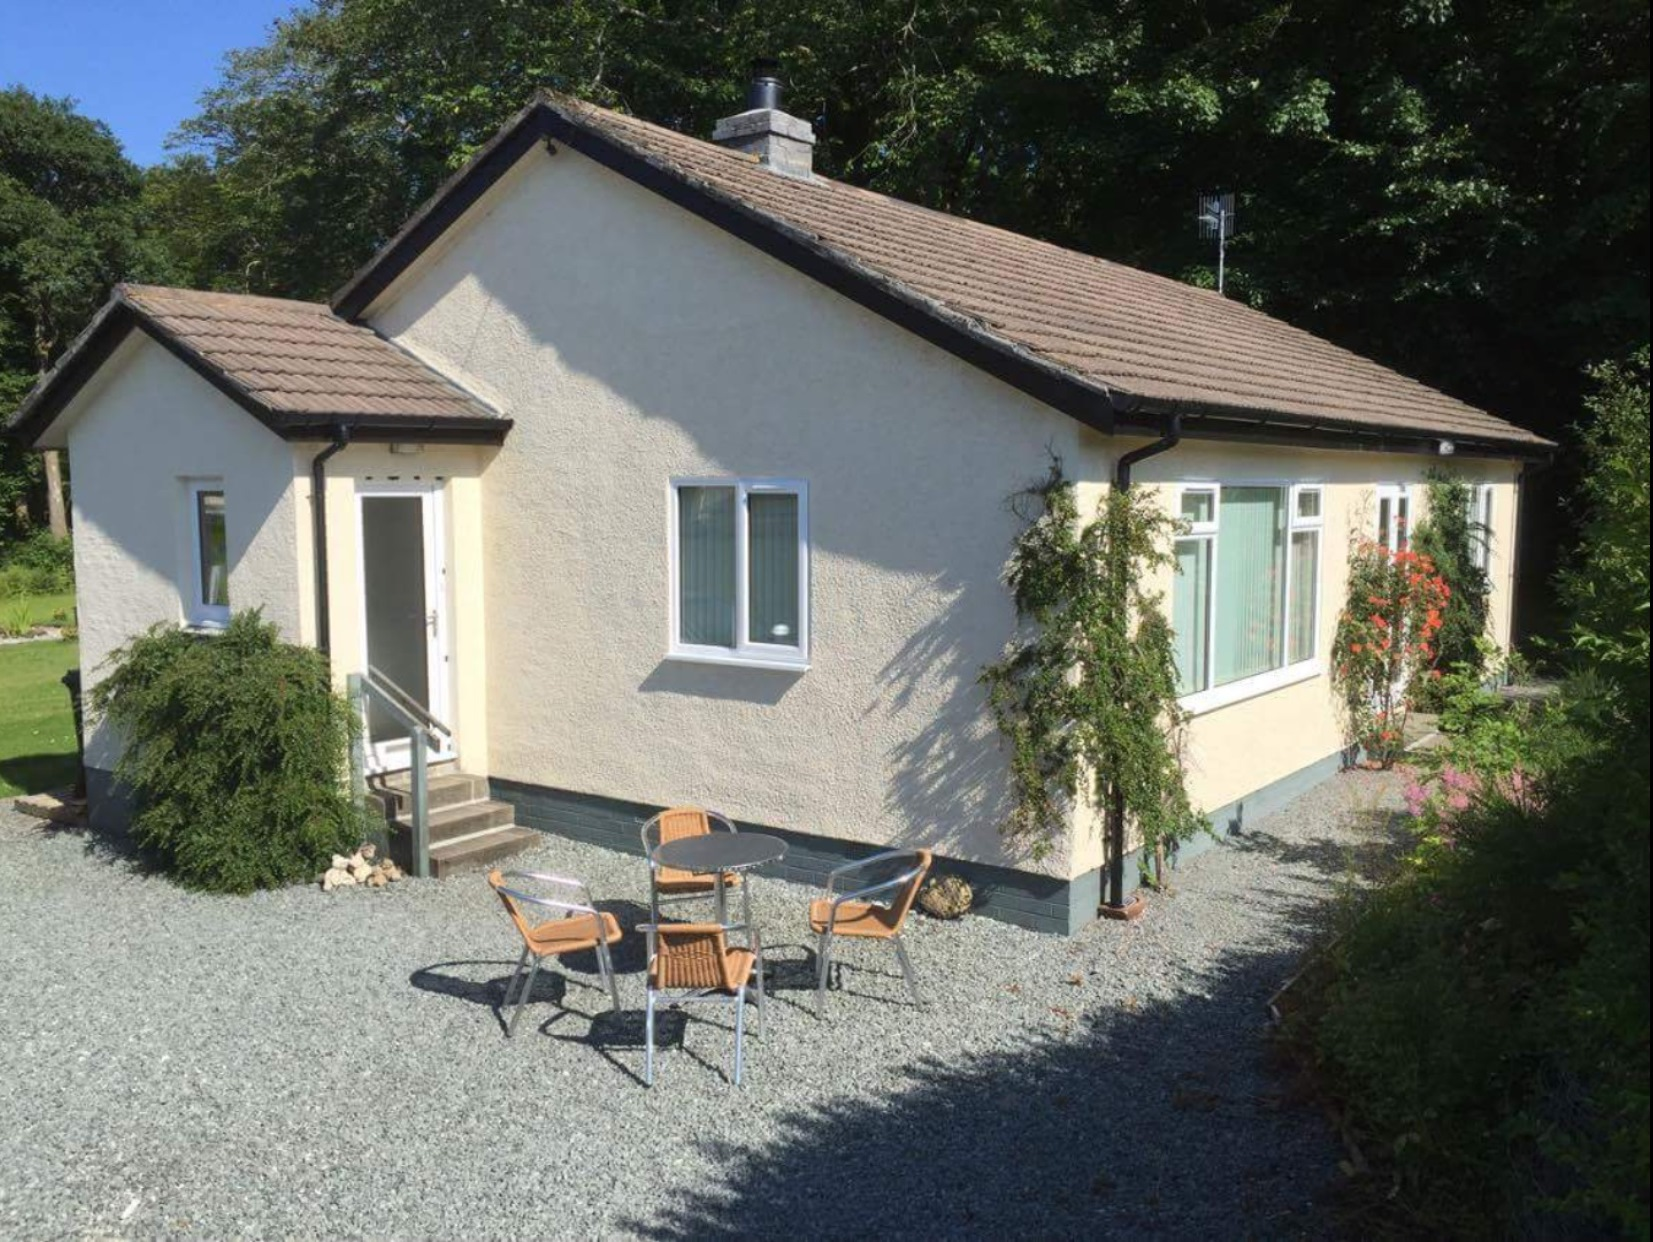 Gesto Cottage, Edinbane, Isle Of Skye, IV51 9PW